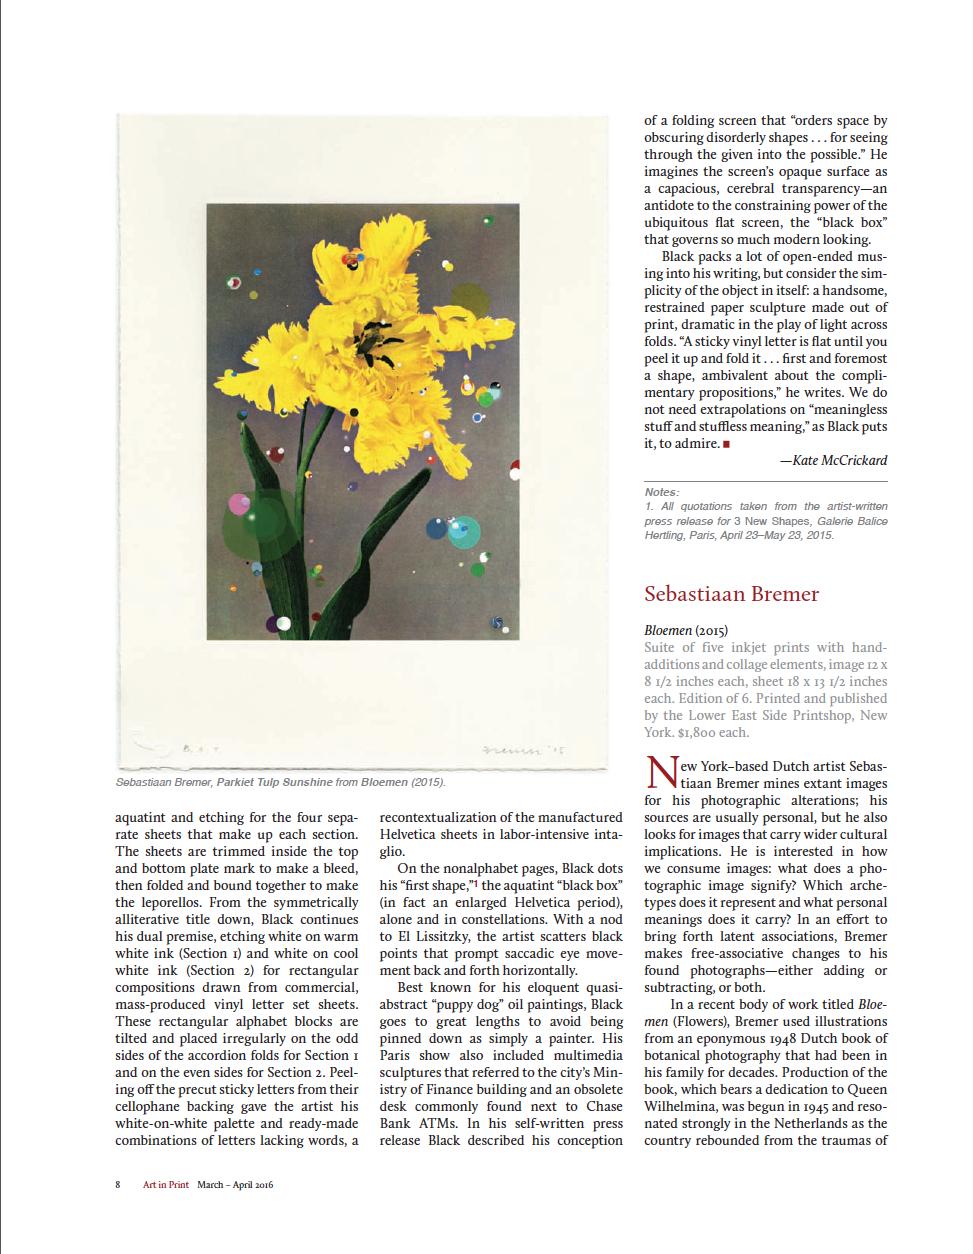 Sebastiaan Bremer in Art in Print - Global Journal of Prints and Ideas, Volume 5, Number 6March - April 2016